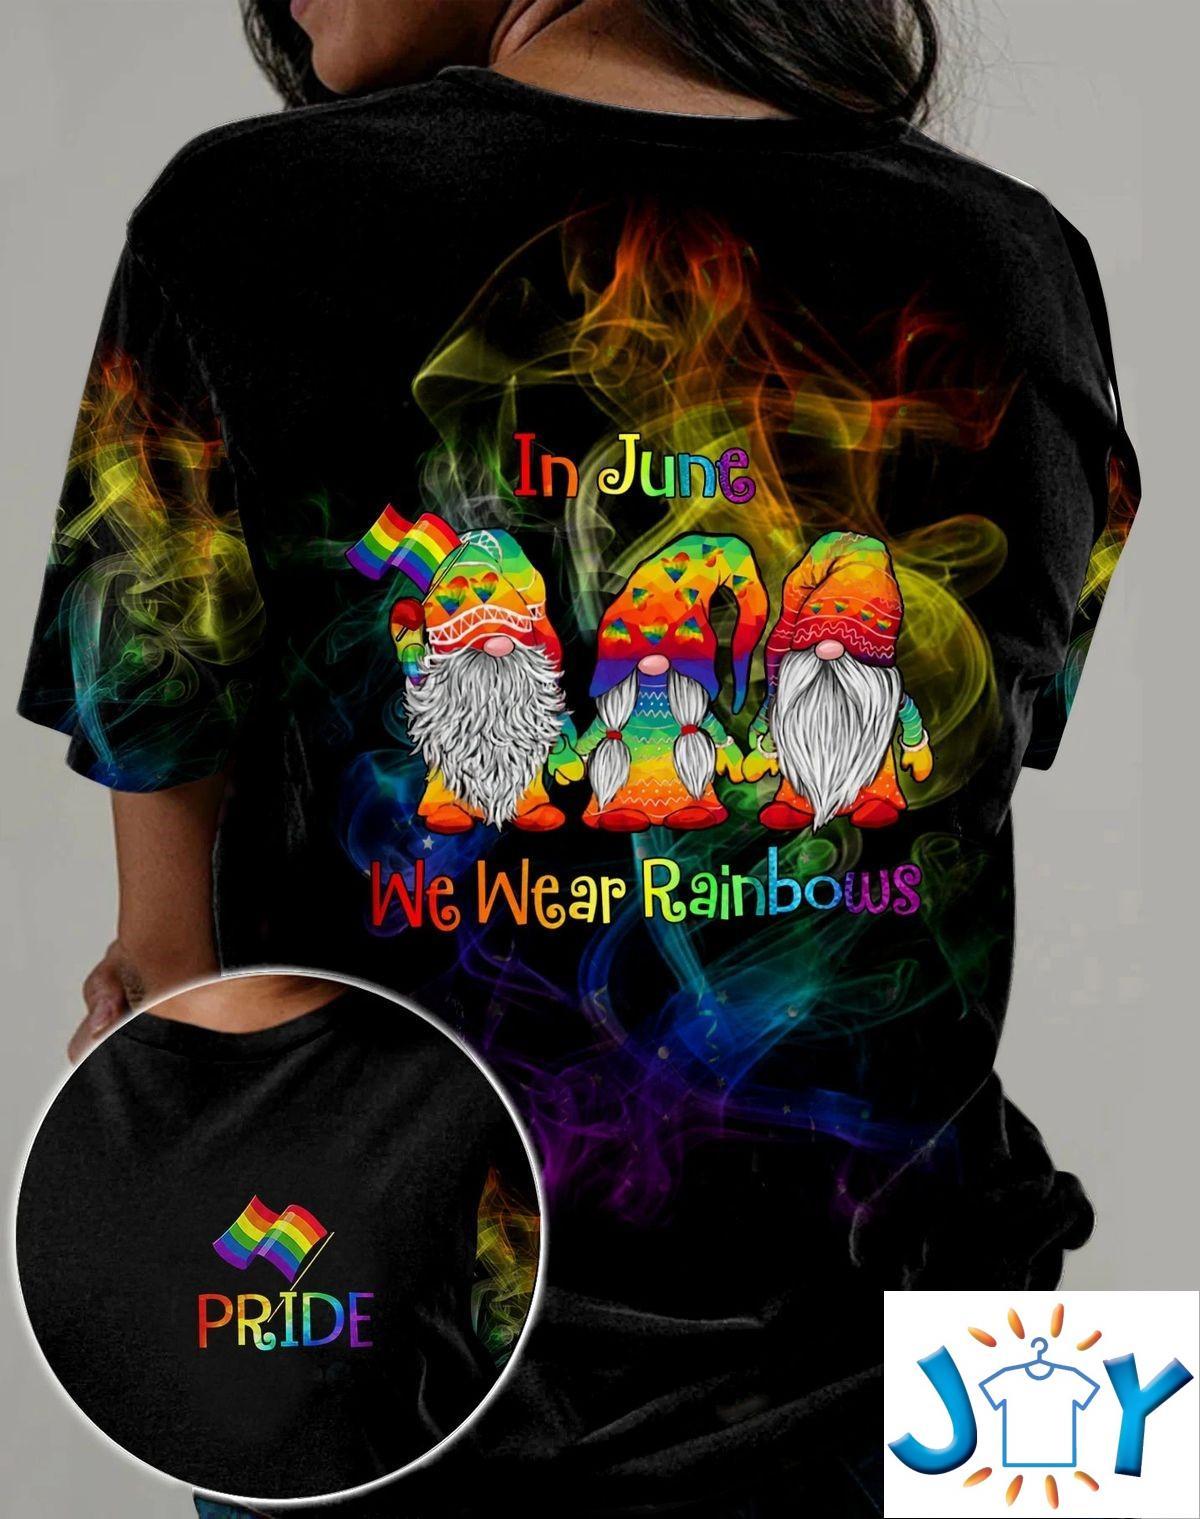 In June We Wear Rainbows 3D All Over Print T-shirt, Hoodie